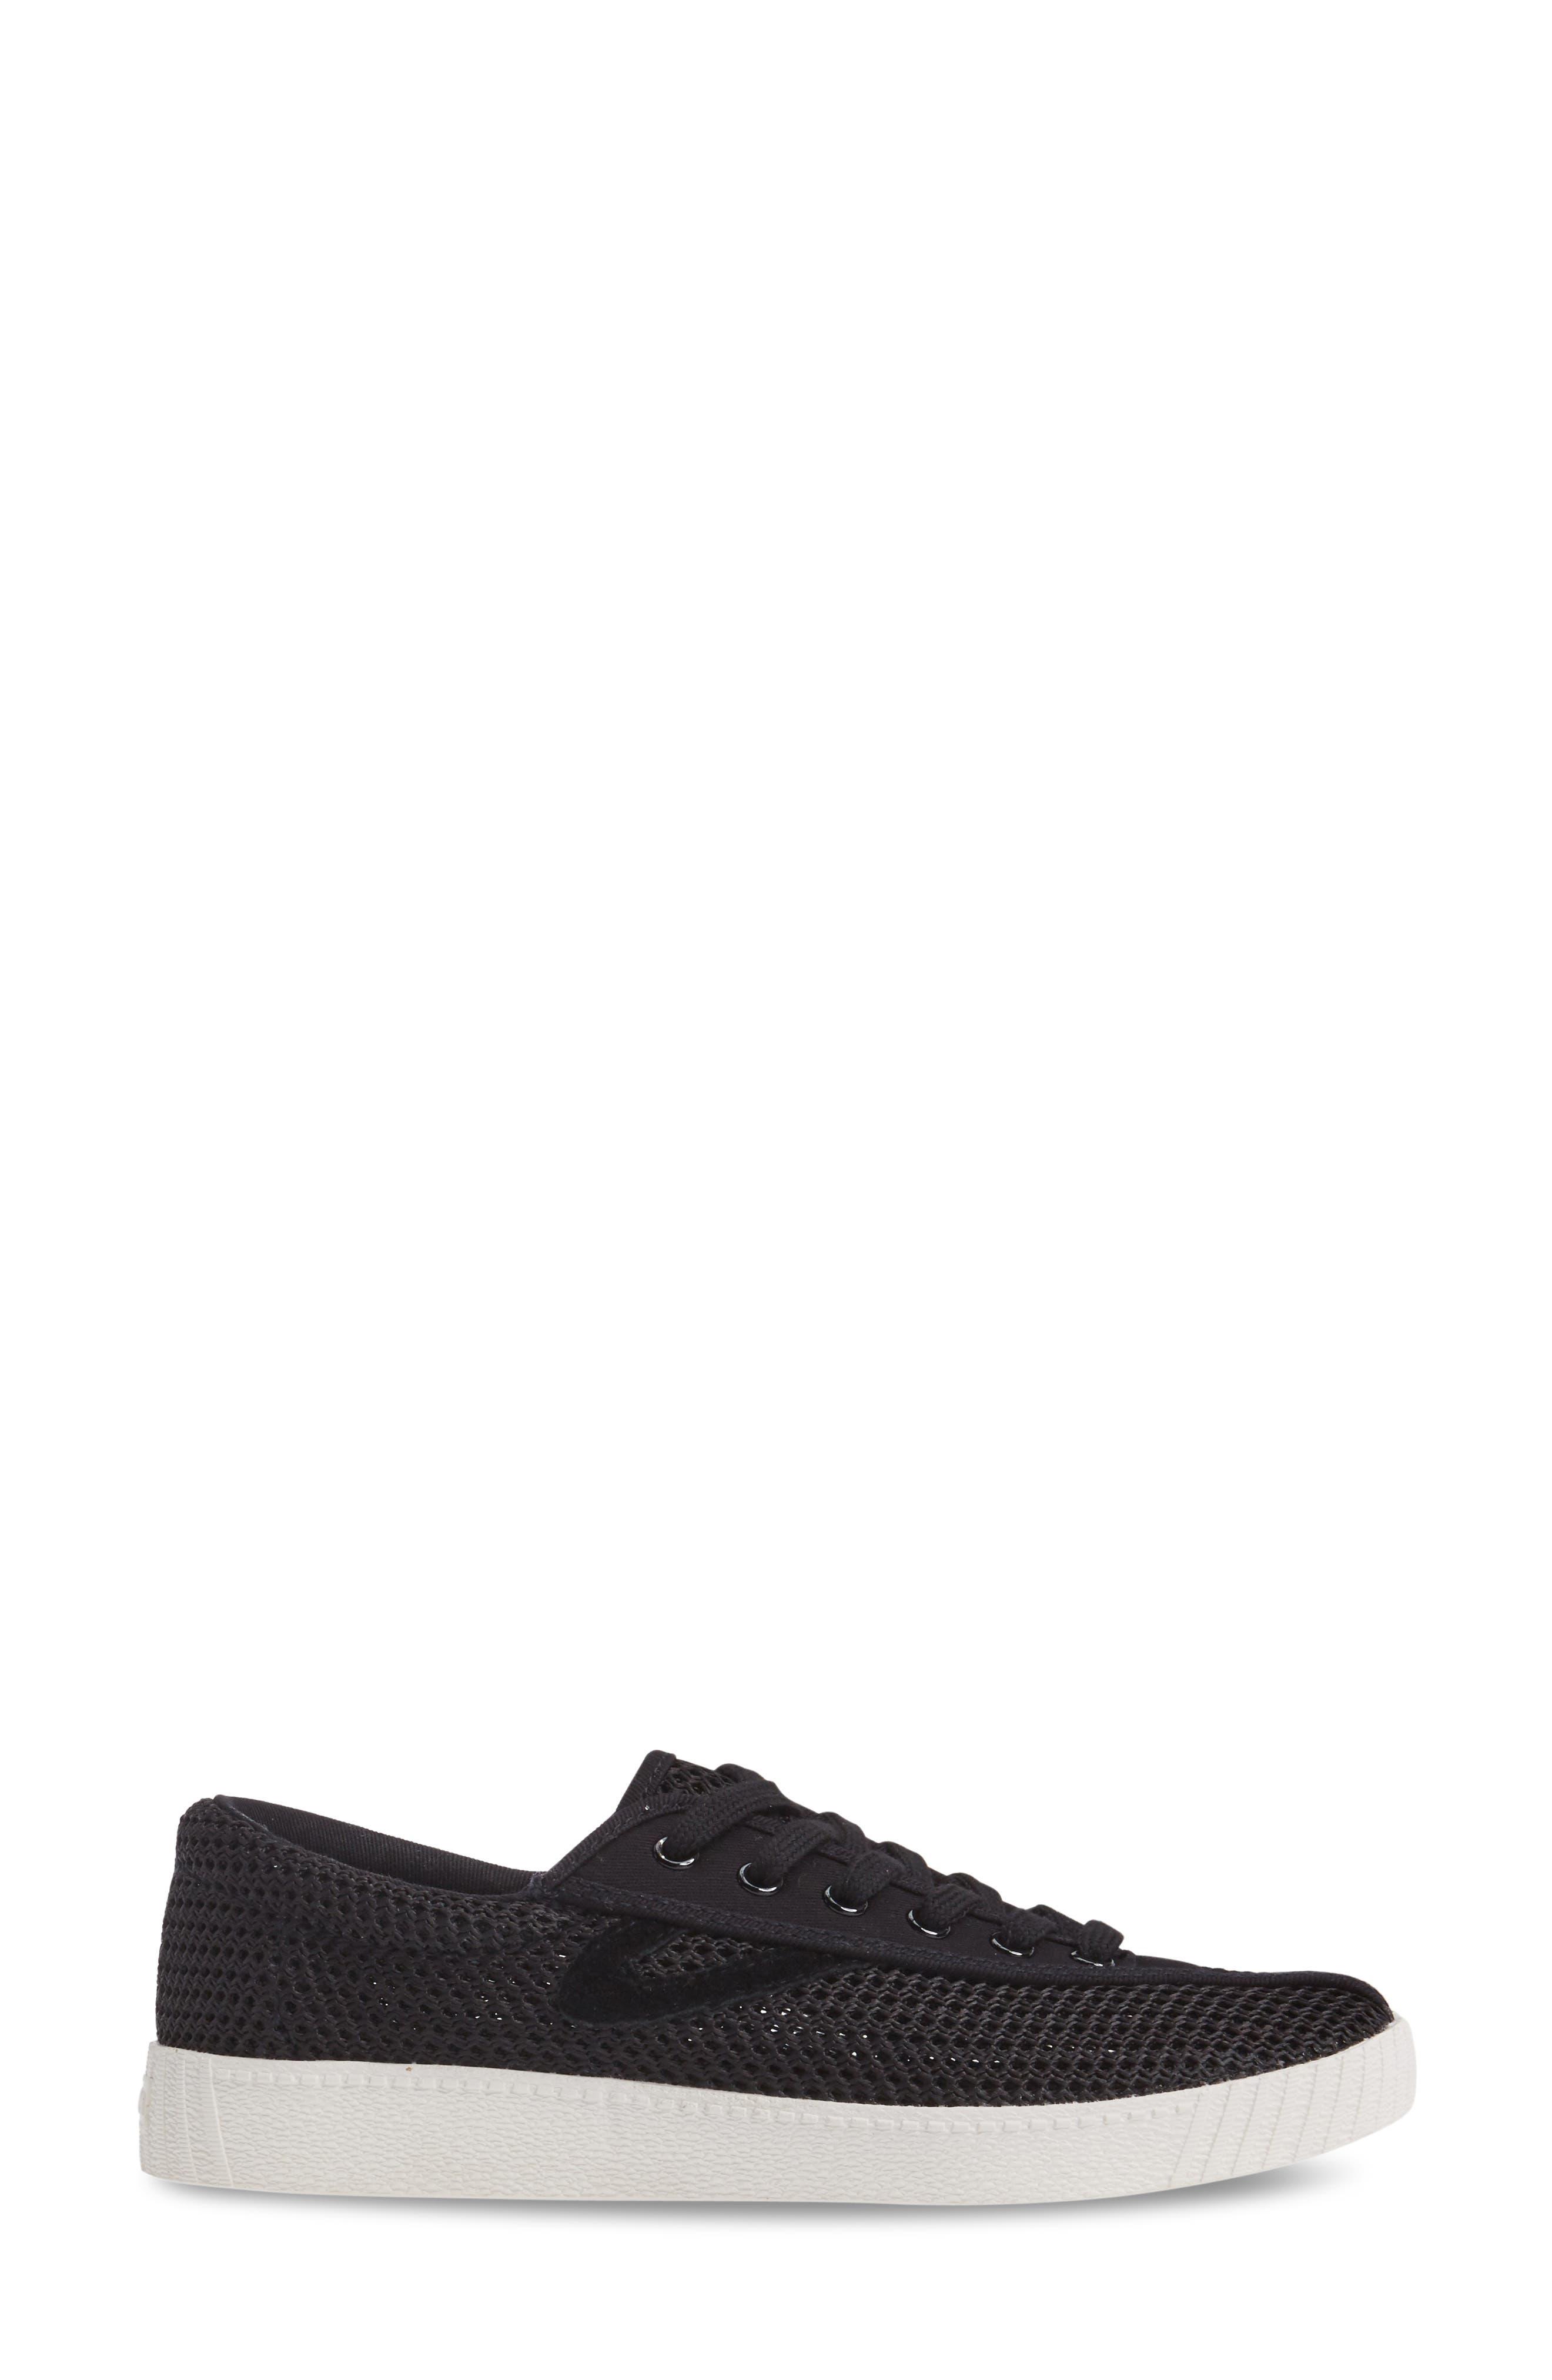 Nylite Sneaker,                             Alternate thumbnail 3, color,                             001